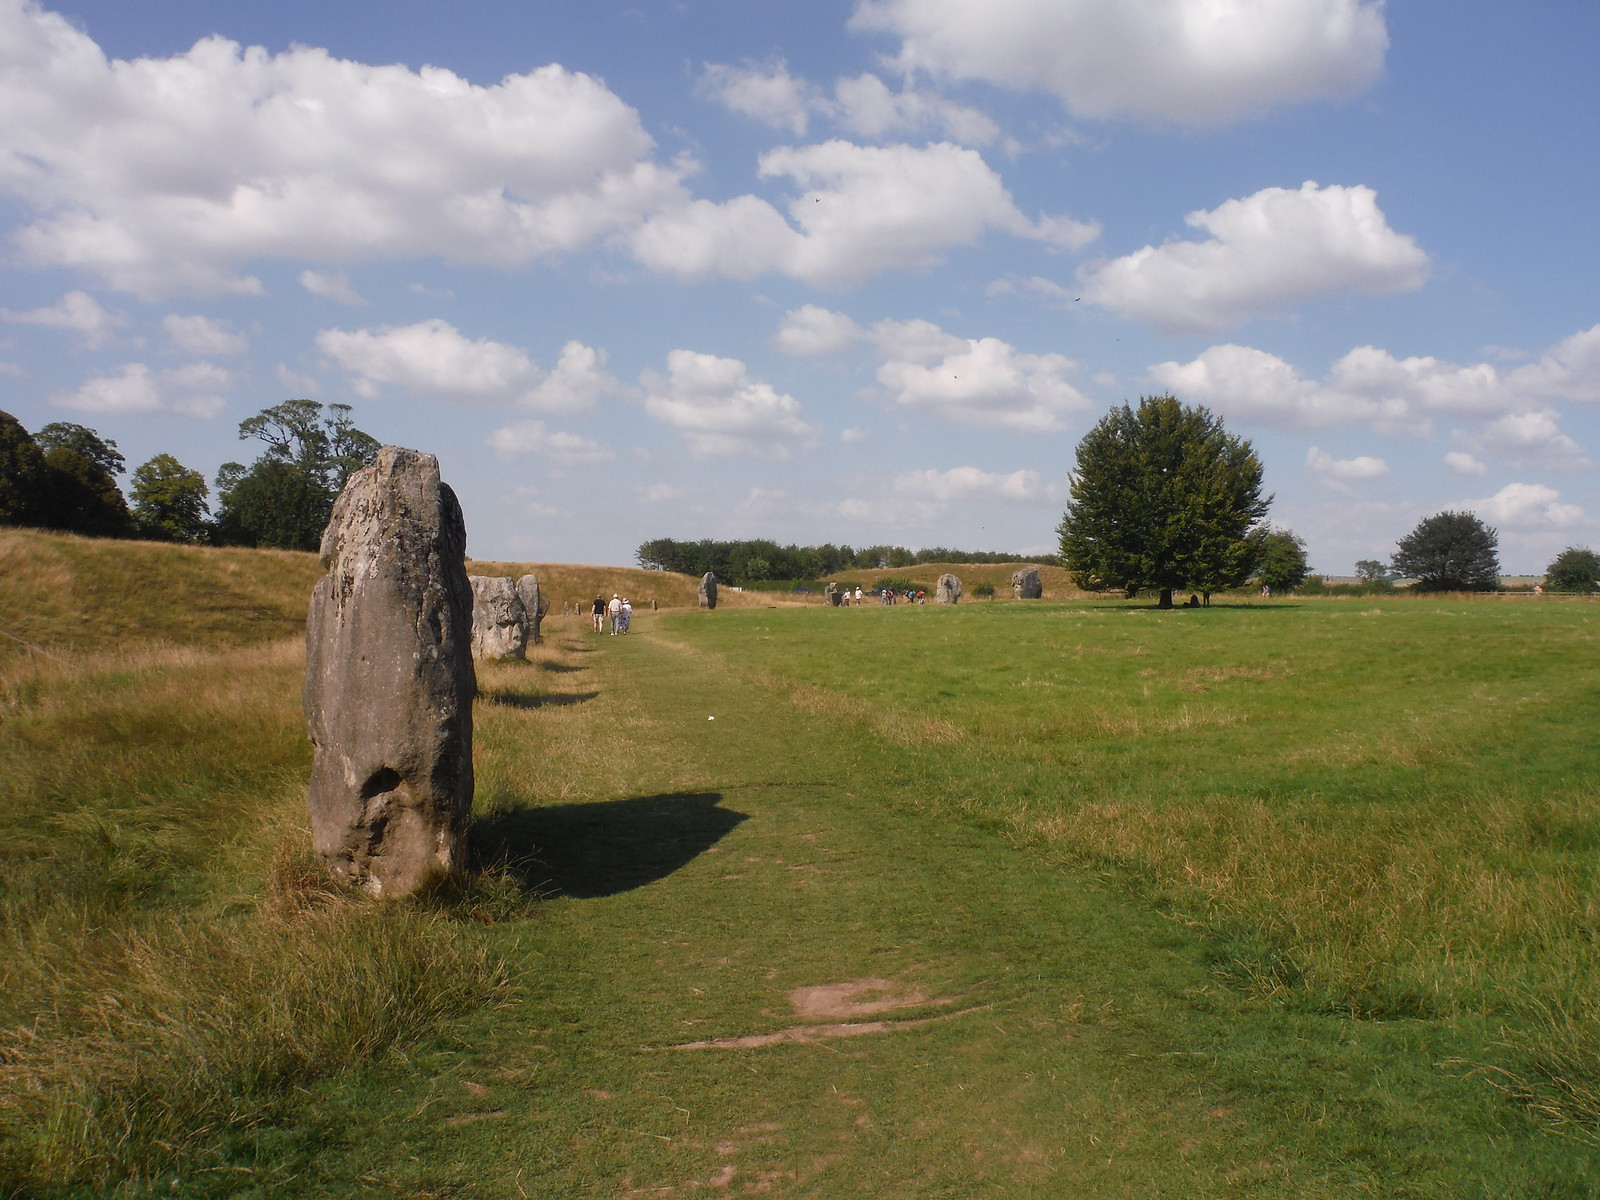 Avebury Standing Stones, NW quartile SWC Walk 255 Pewsey or Marlborough Circular via Avebury